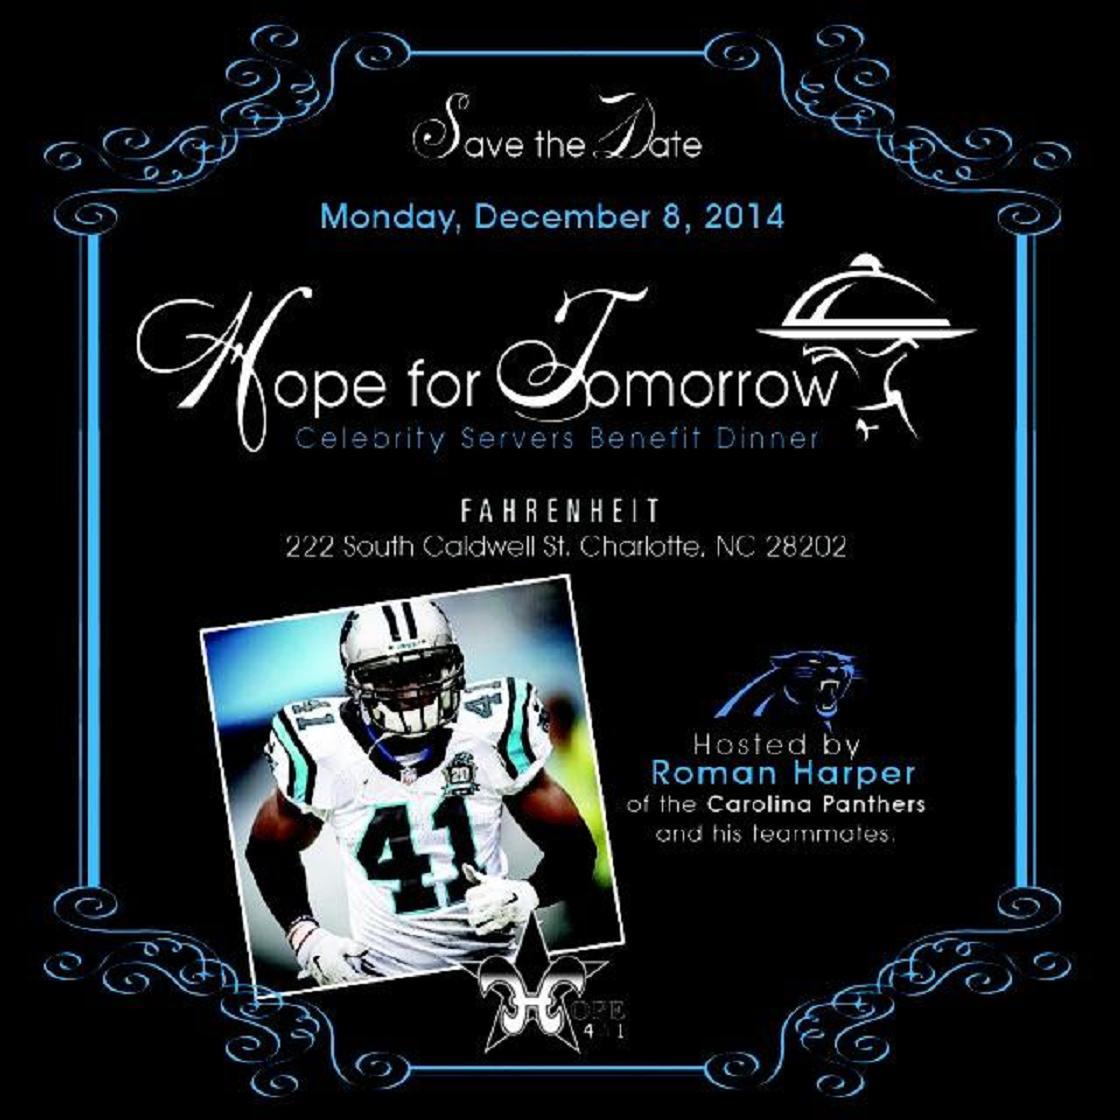 Join @Harp41/@HarpersHope_41 @Panthers @Rock1chef @JeffGordonWine @FahrenheitCLT for R youths! http://t.co/8ZUkJg8TTC http://t.co/gcpsJIToHn